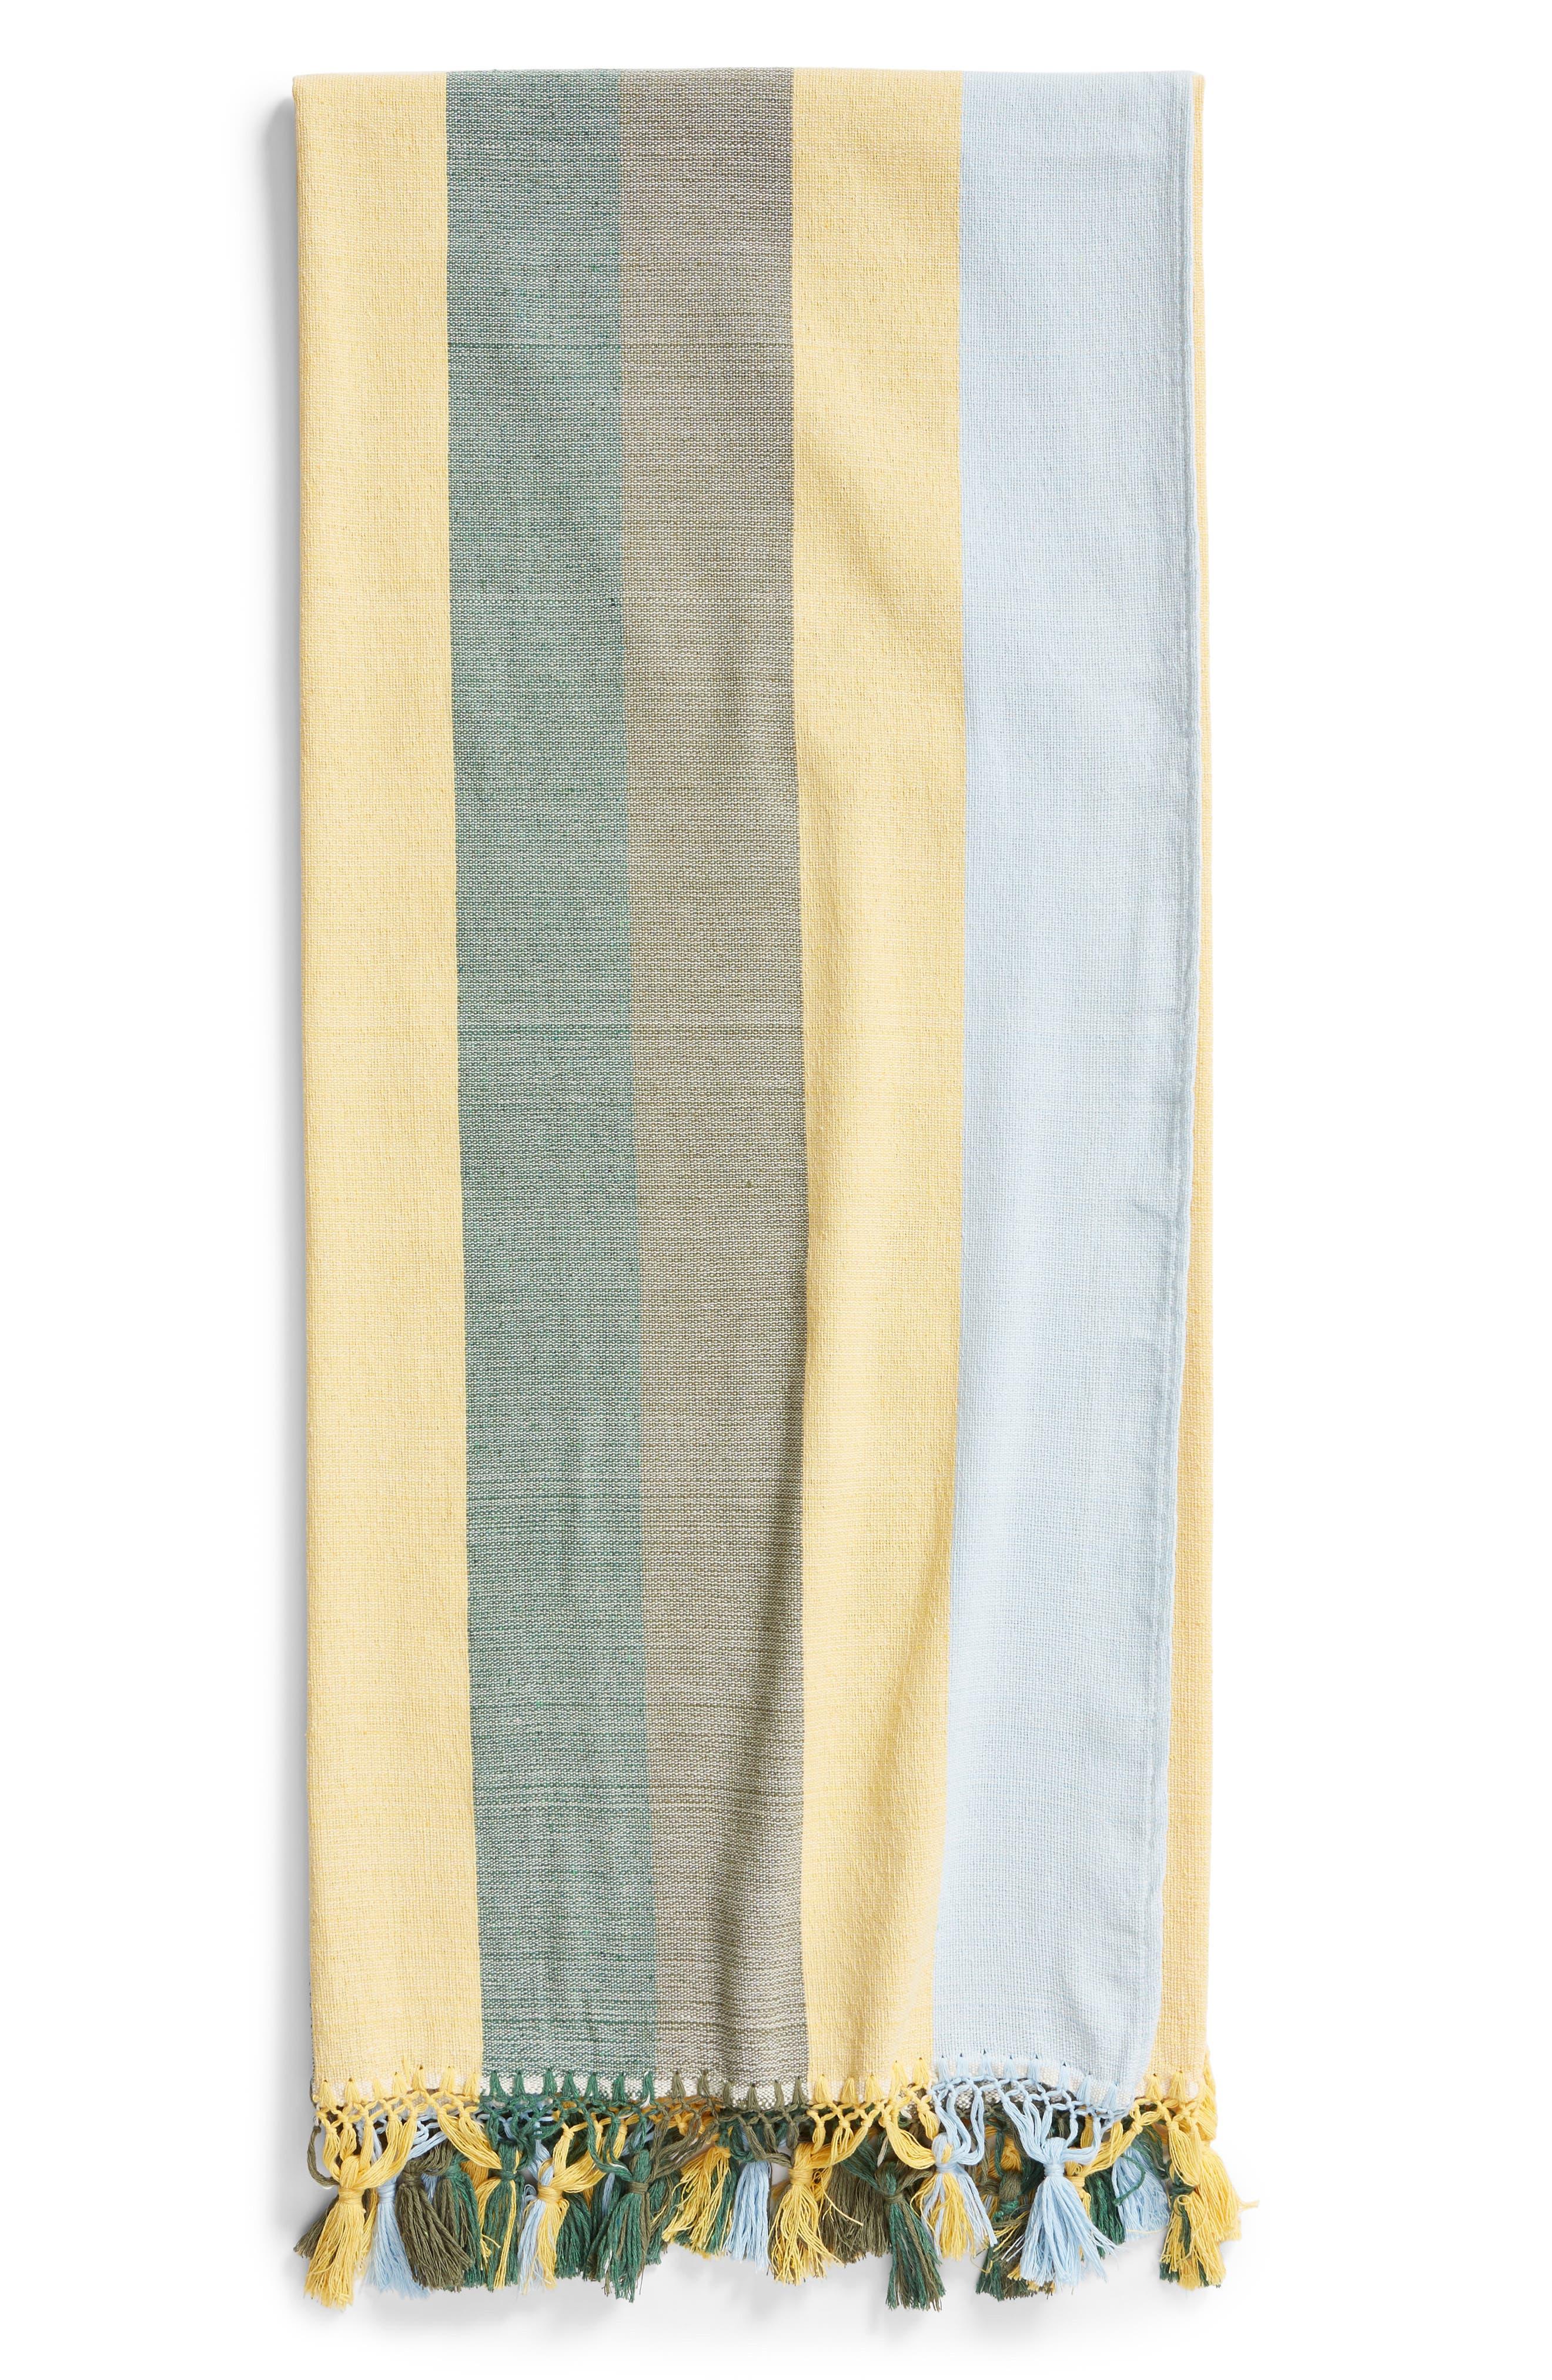 Forest Stripe Woven Cotton Blanket,                             Main thumbnail 1, color,                             020